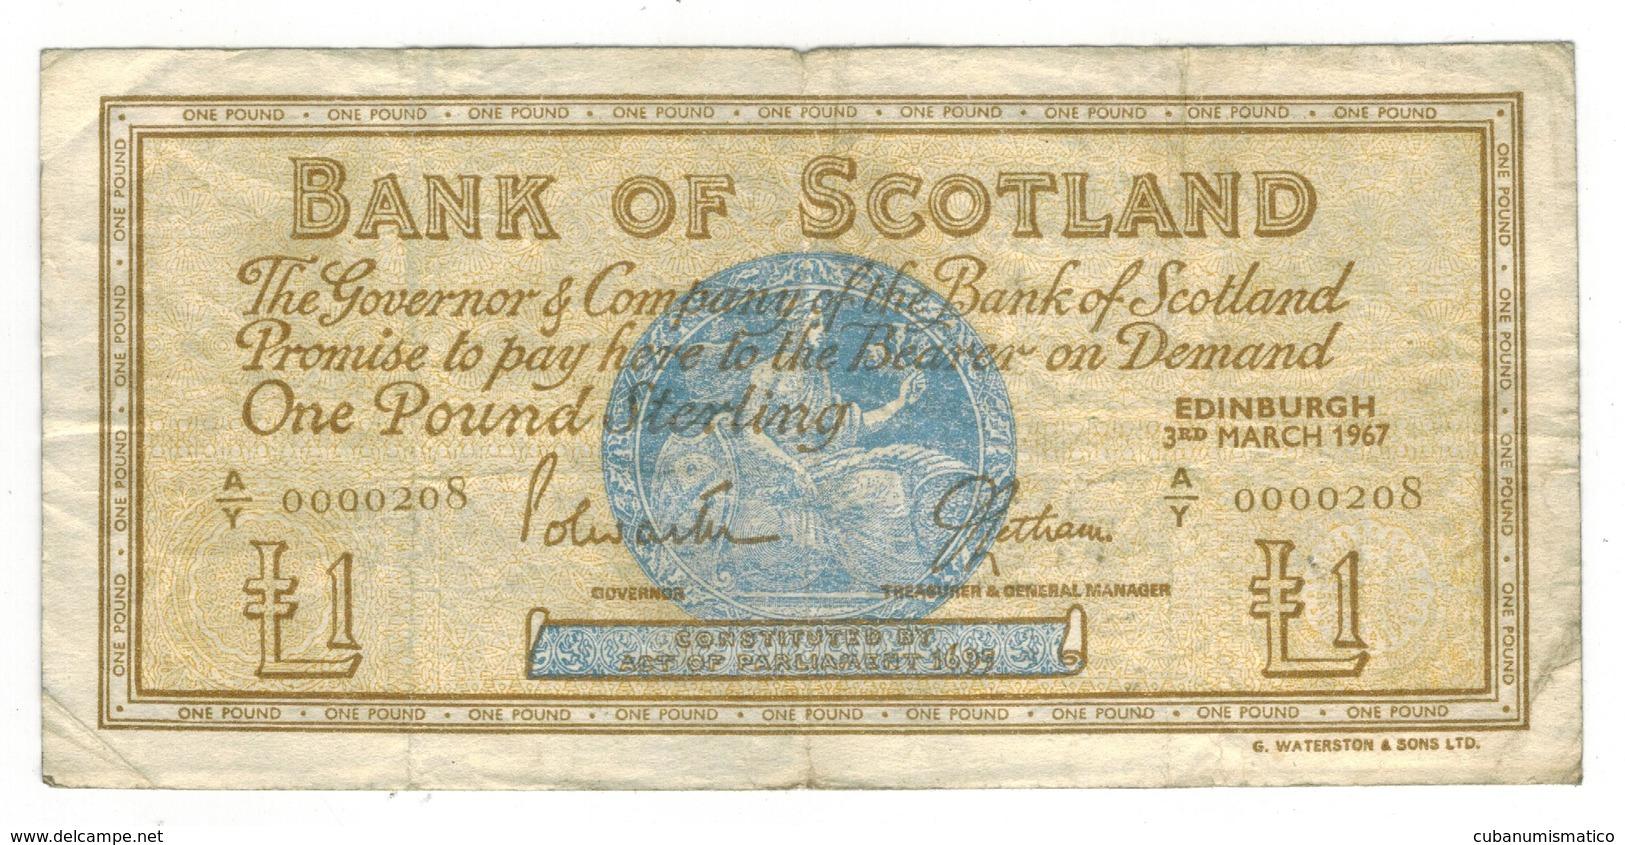 1967 Issue Bank Of Scotland 1 Pound Note - F - KM# 105b - Fine - Ecosse